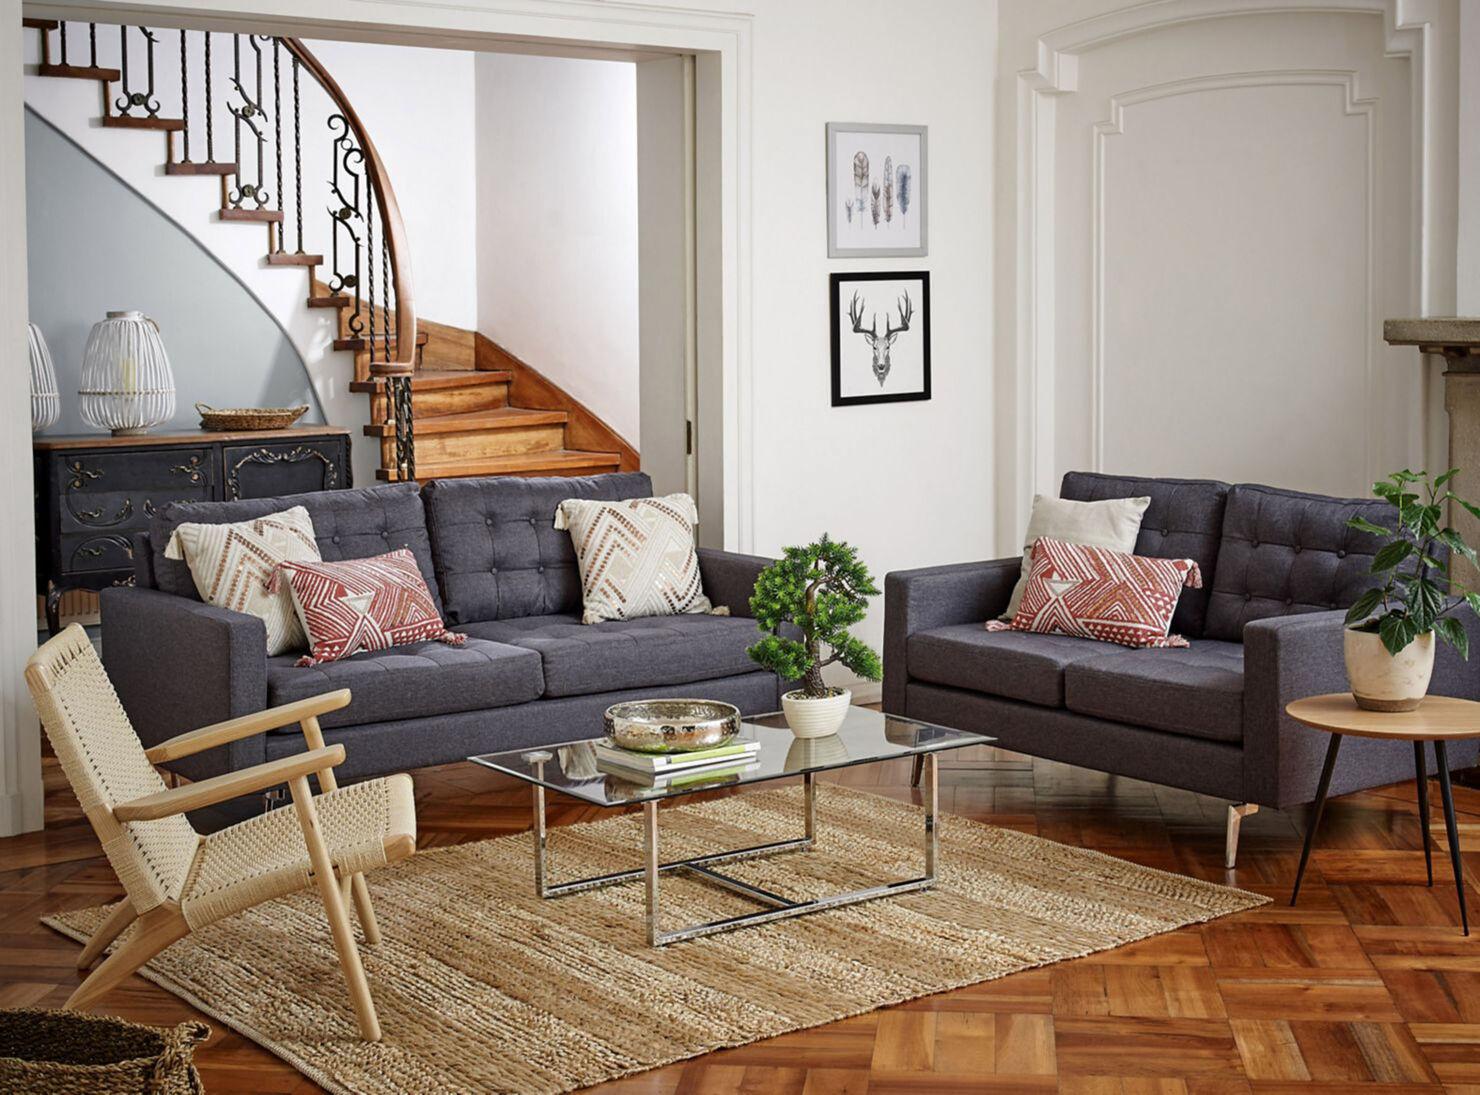 Phenomenal Juego De Living Kenney Tela Sofas 3C 2C Attimo Download Free Architecture Designs Intelgarnamadebymaigaardcom